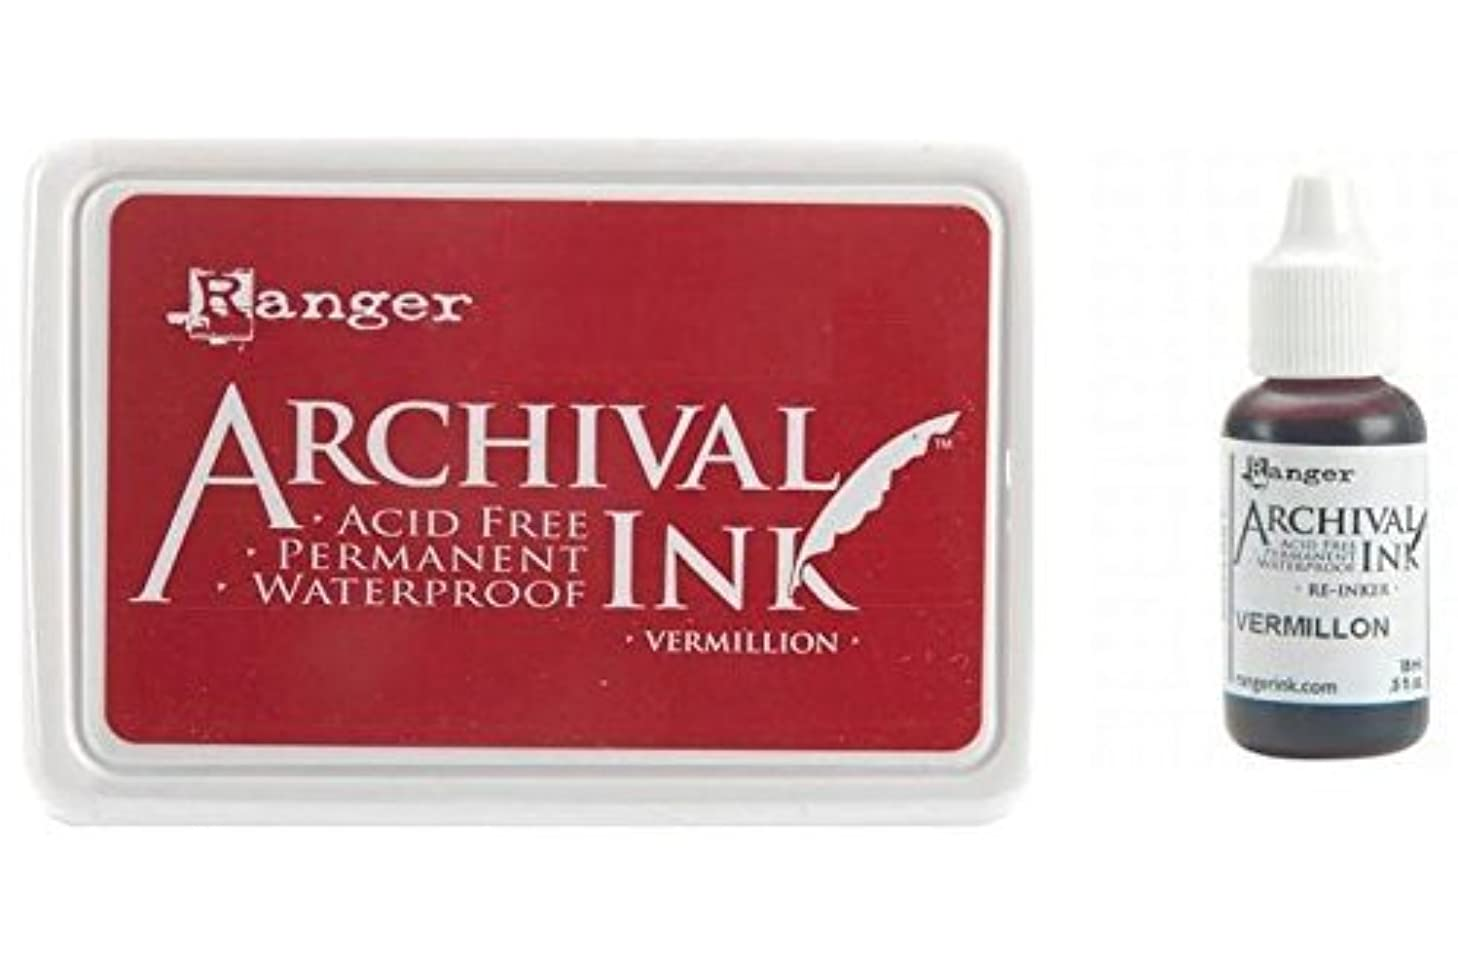 Ranger Archival Vermillion Red Permanent Dye Ink Stamp Pad & Re-Inker